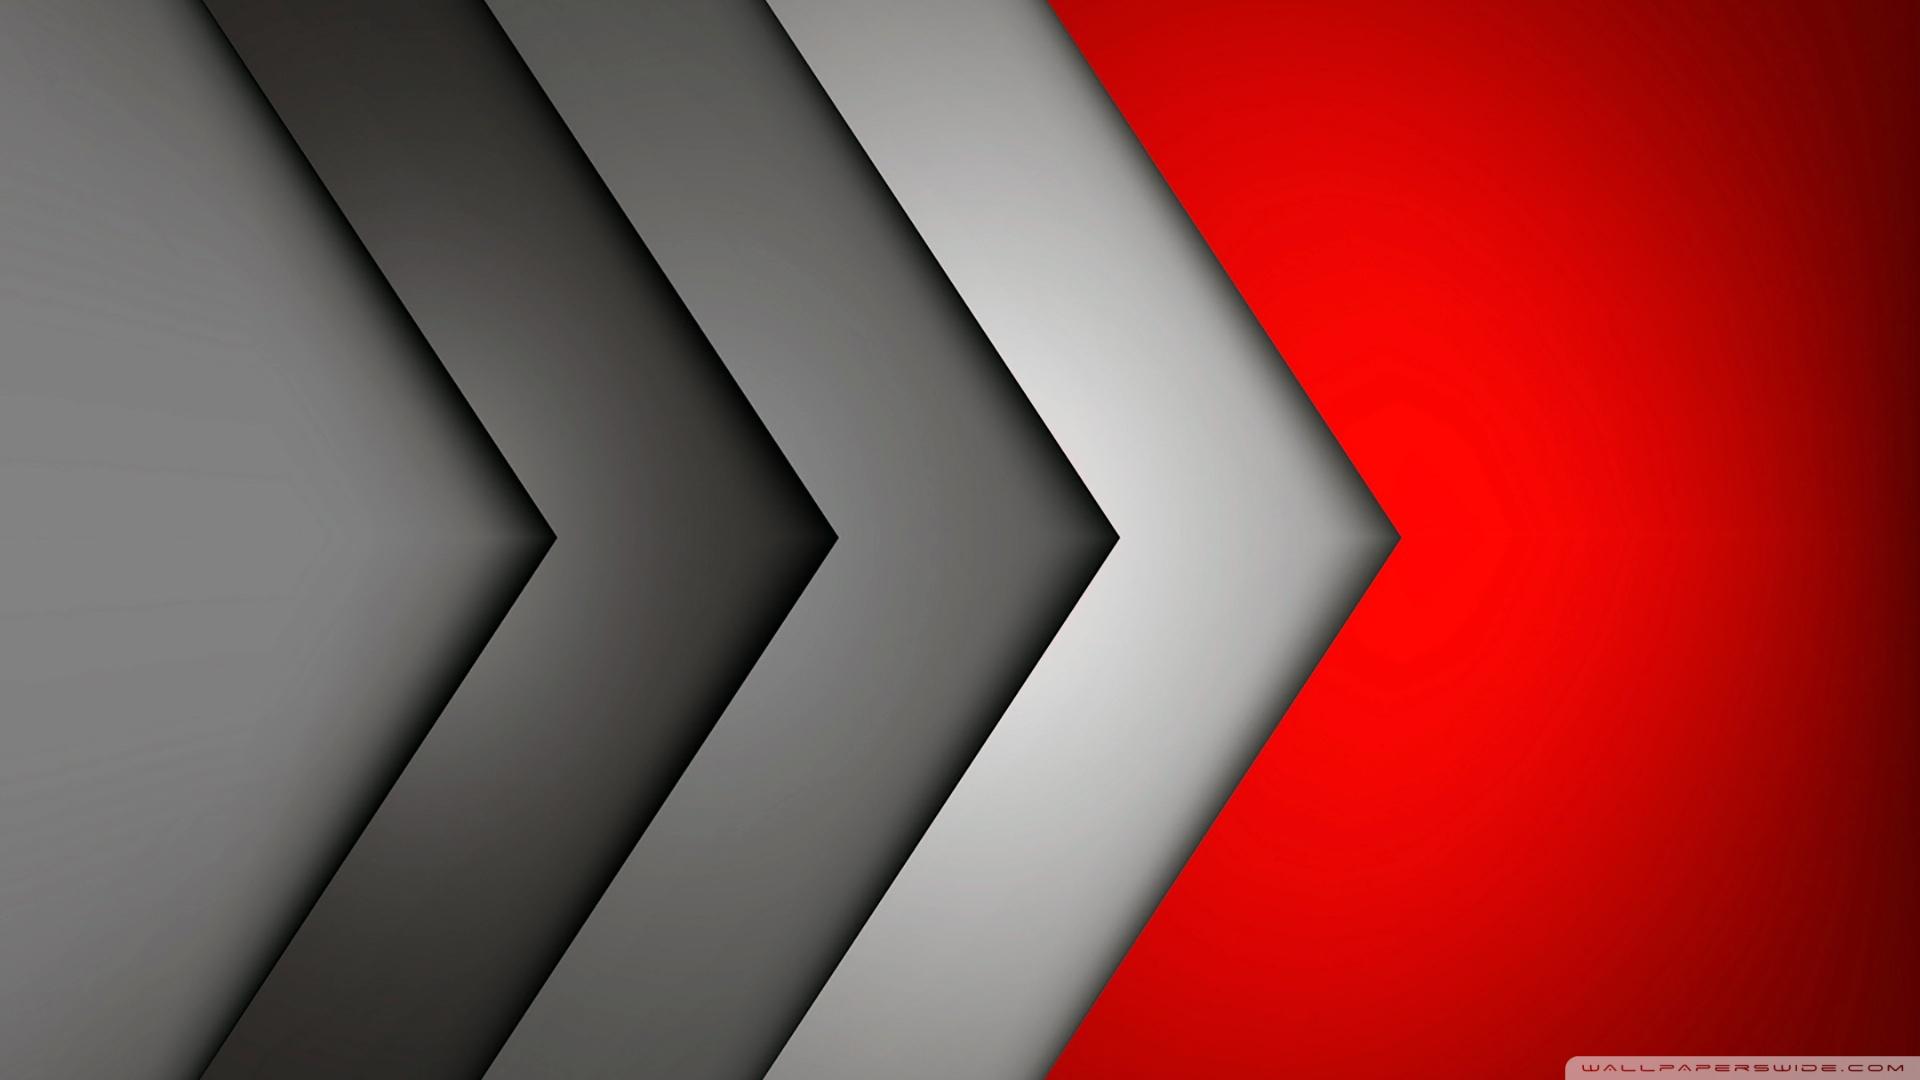 Material Design Wallpaper Iphone X Material Design Ultra Hd Desktop Background Wallpaper For